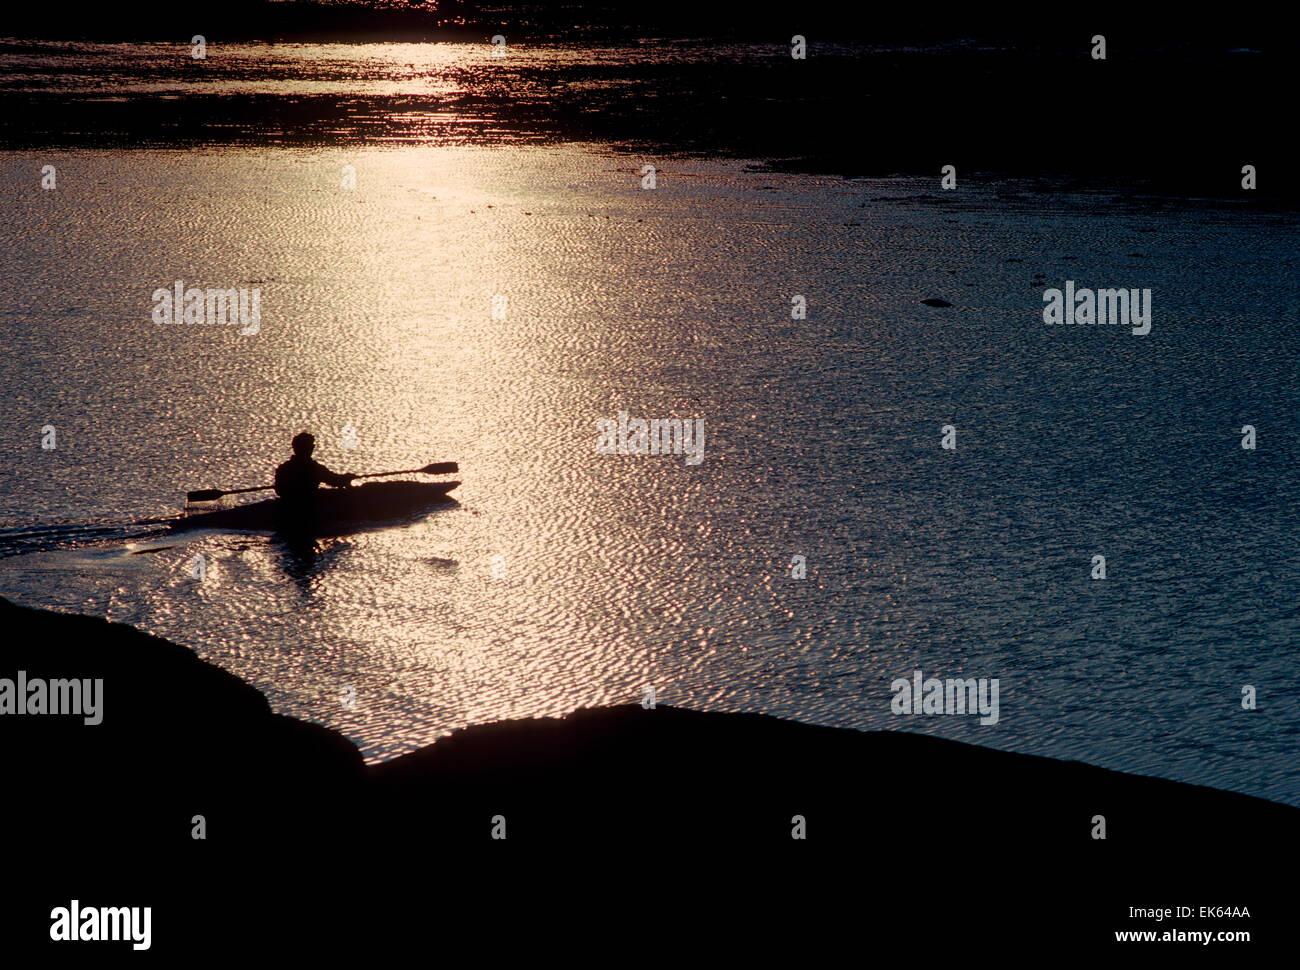 INUIT KAYAKER AT SUNSET, PANGNIRTUNG FIORD, BAFFIN ISLAND, NORTHWEST TERRITORIES, NUNAVUT, CANADA - Stock Image